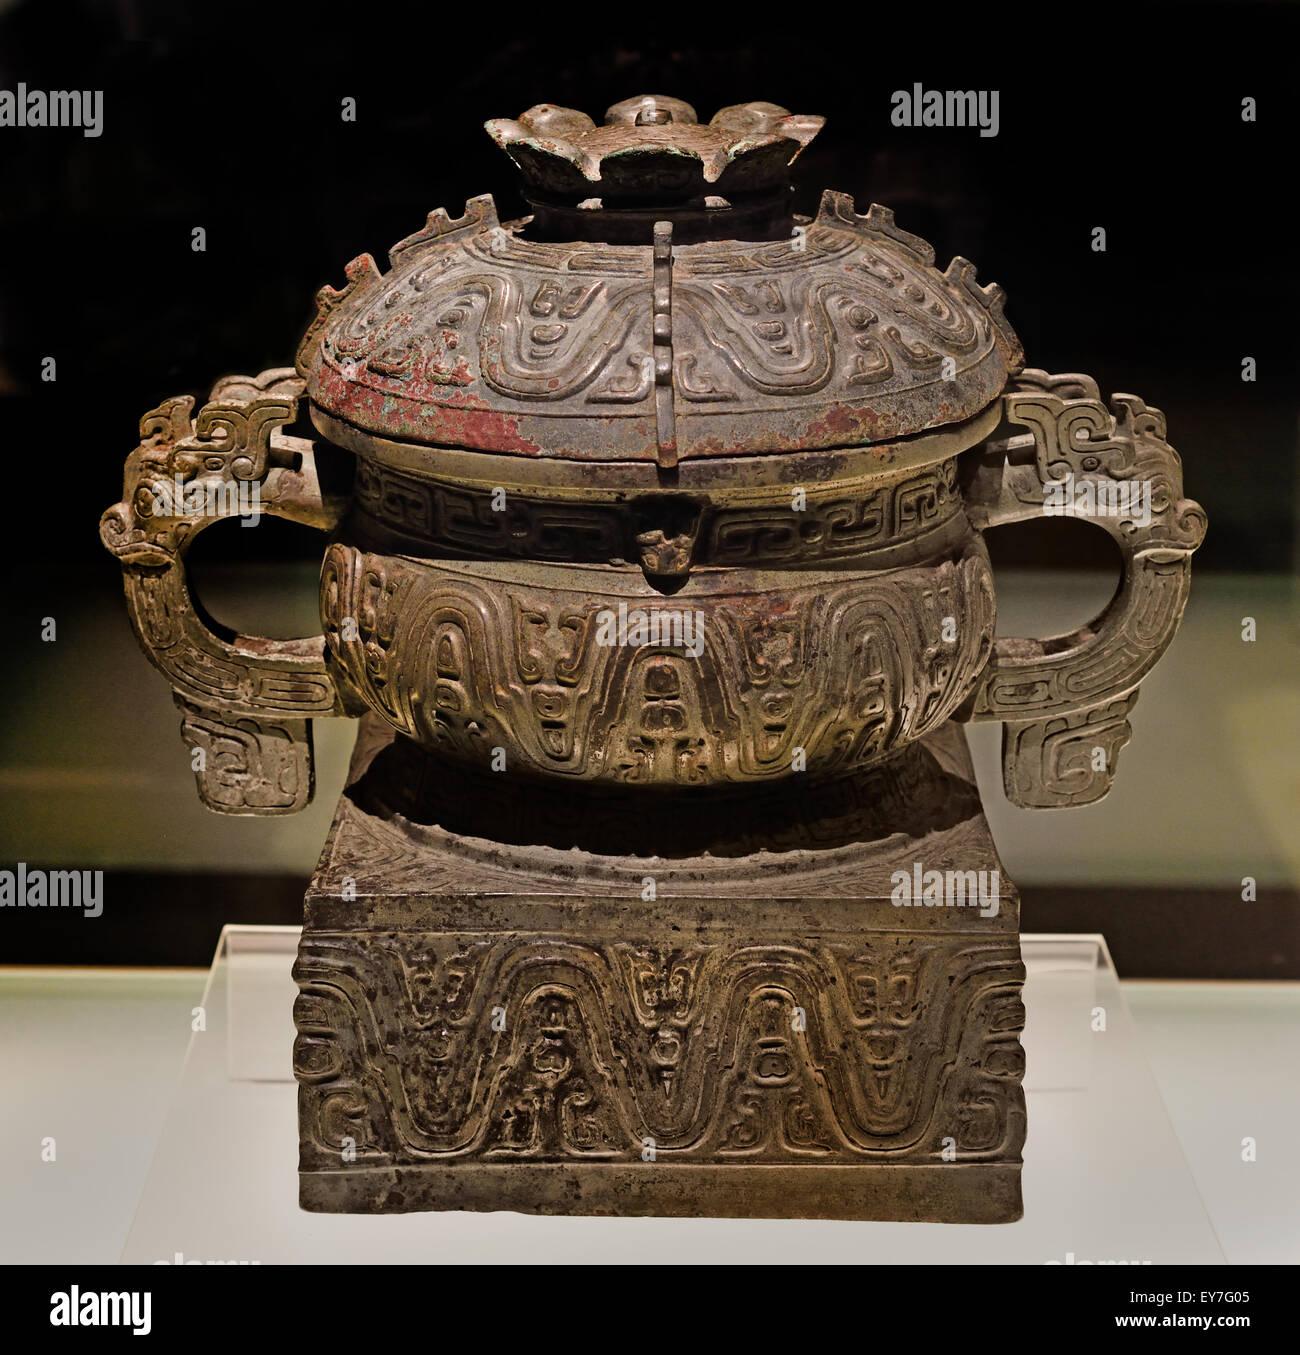 Hu Gui ( food Vessel ) Late western Zhou 9th century 771 BC Shanghai Museum of ancient Chinese art China Bronze - Stock Image